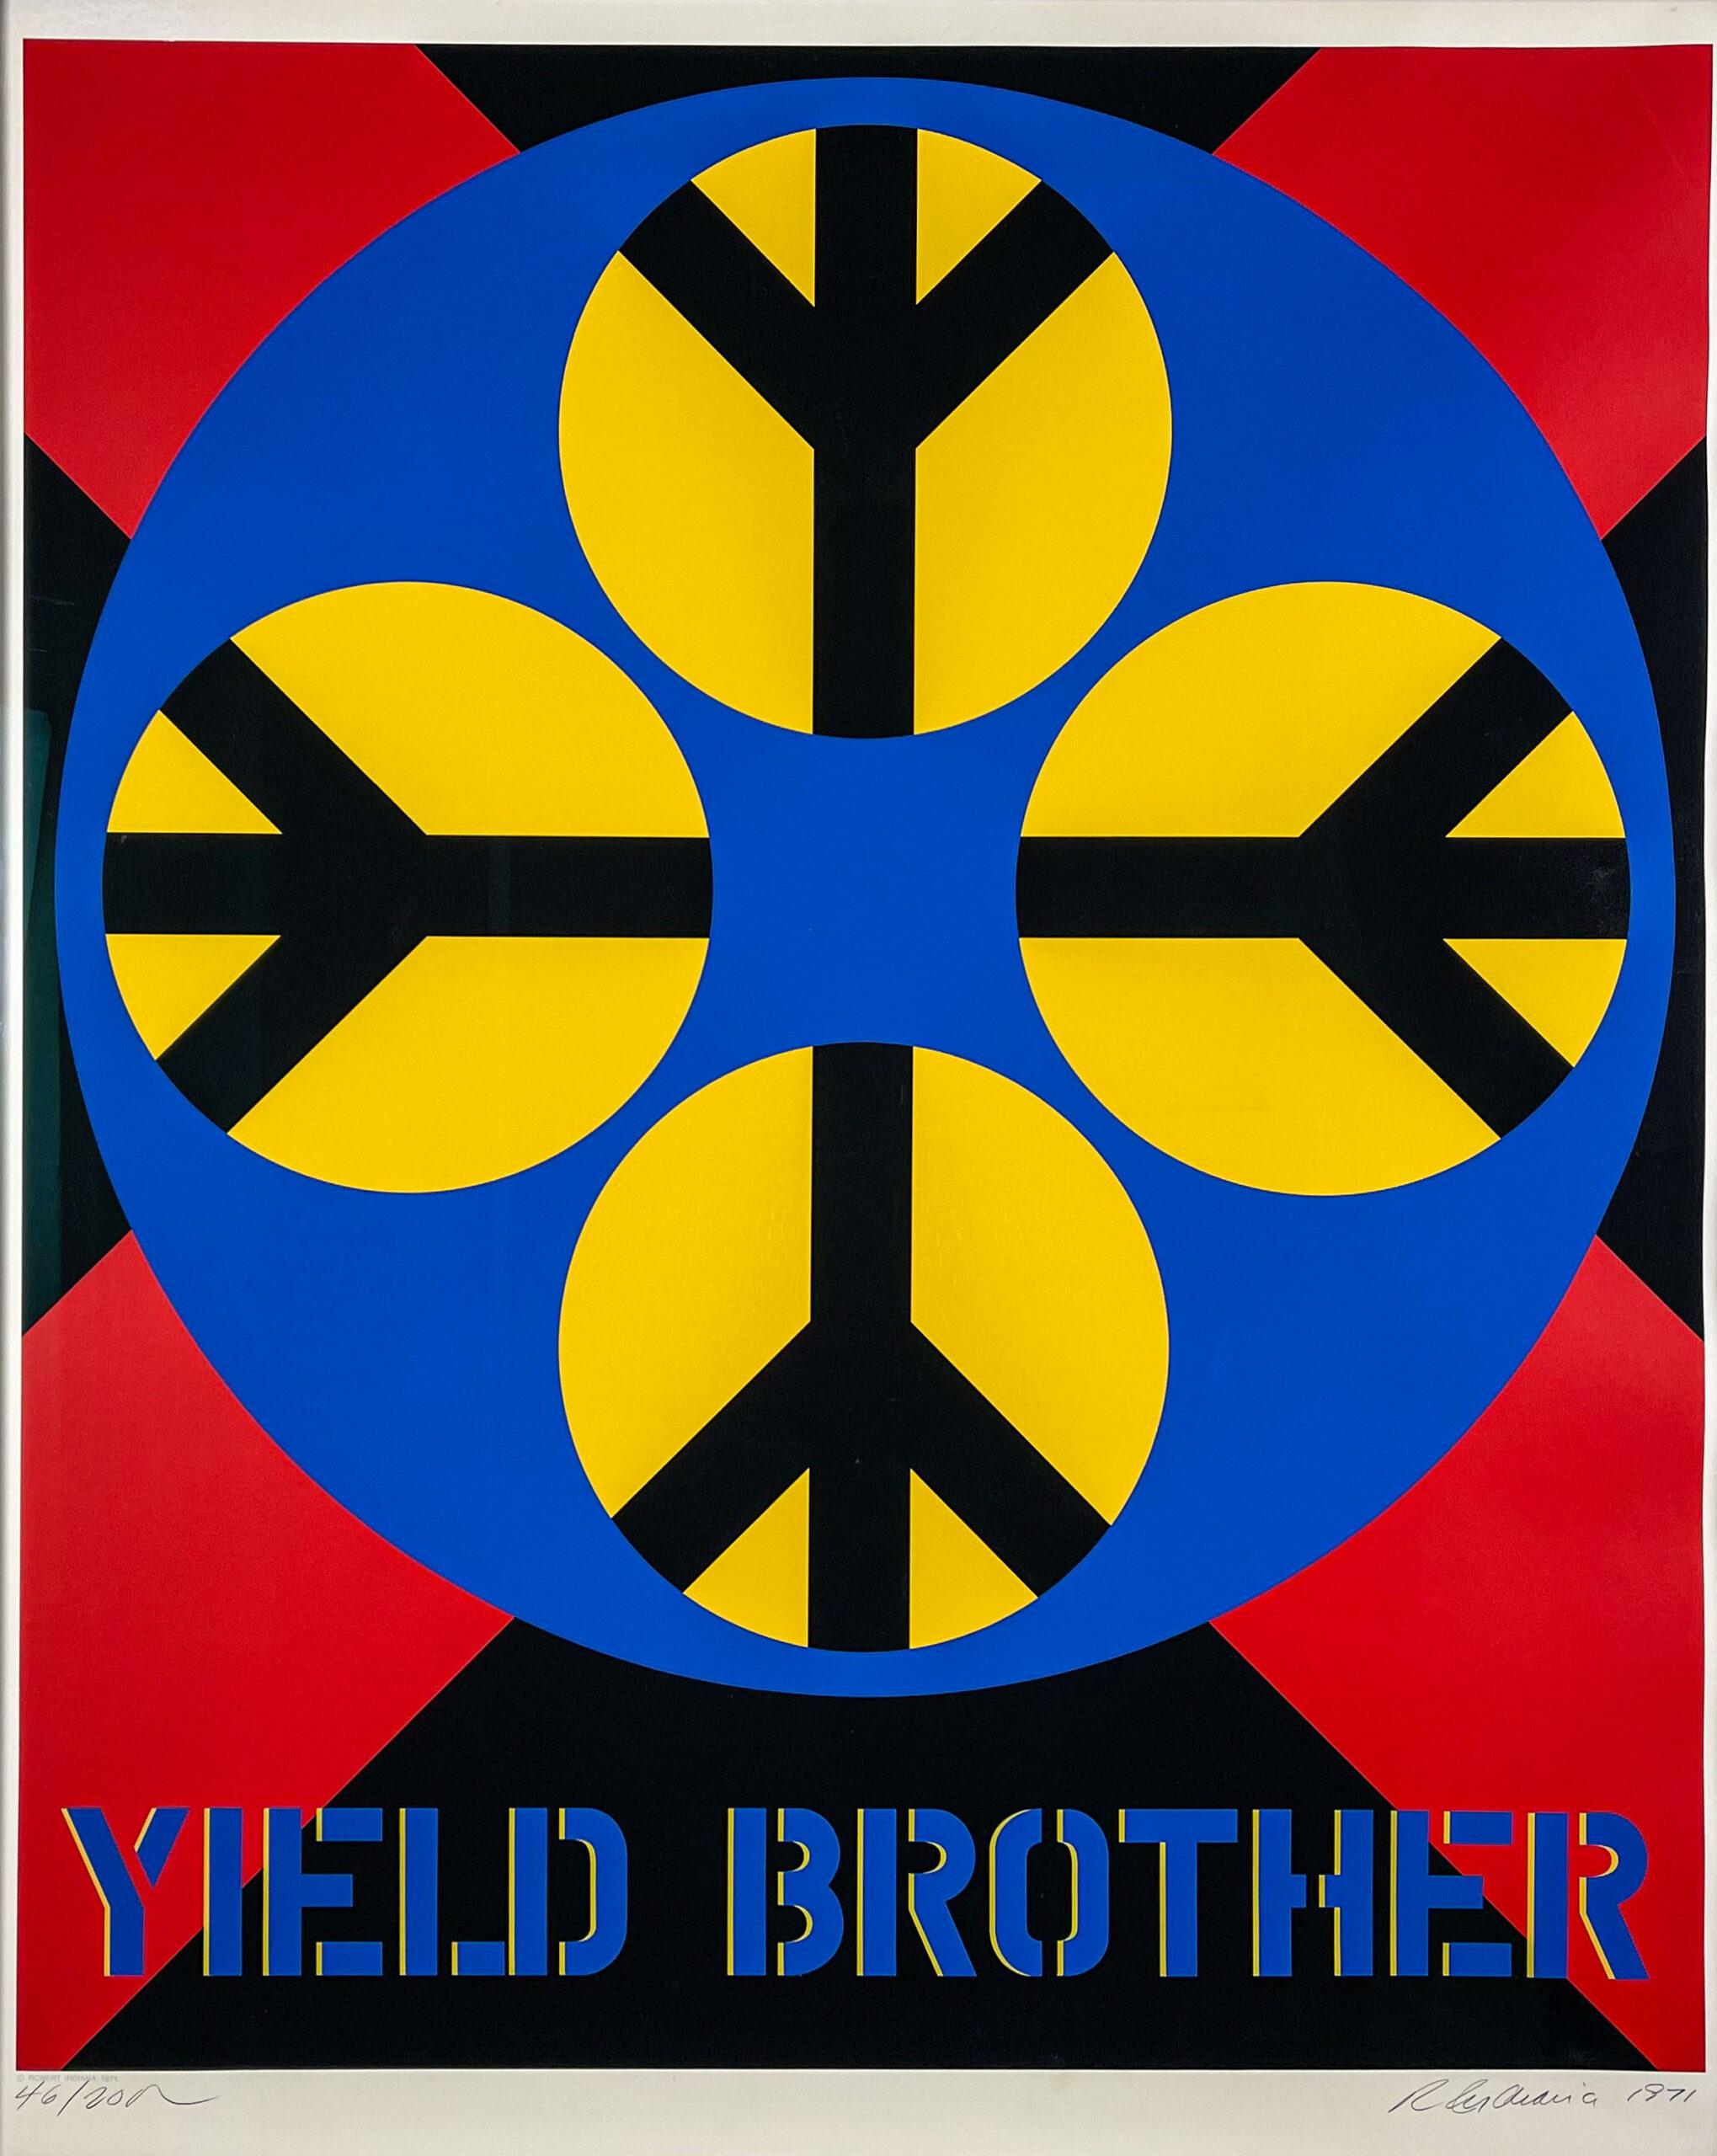 Robert Indiana Yield Brother 1971 Sheet web-1